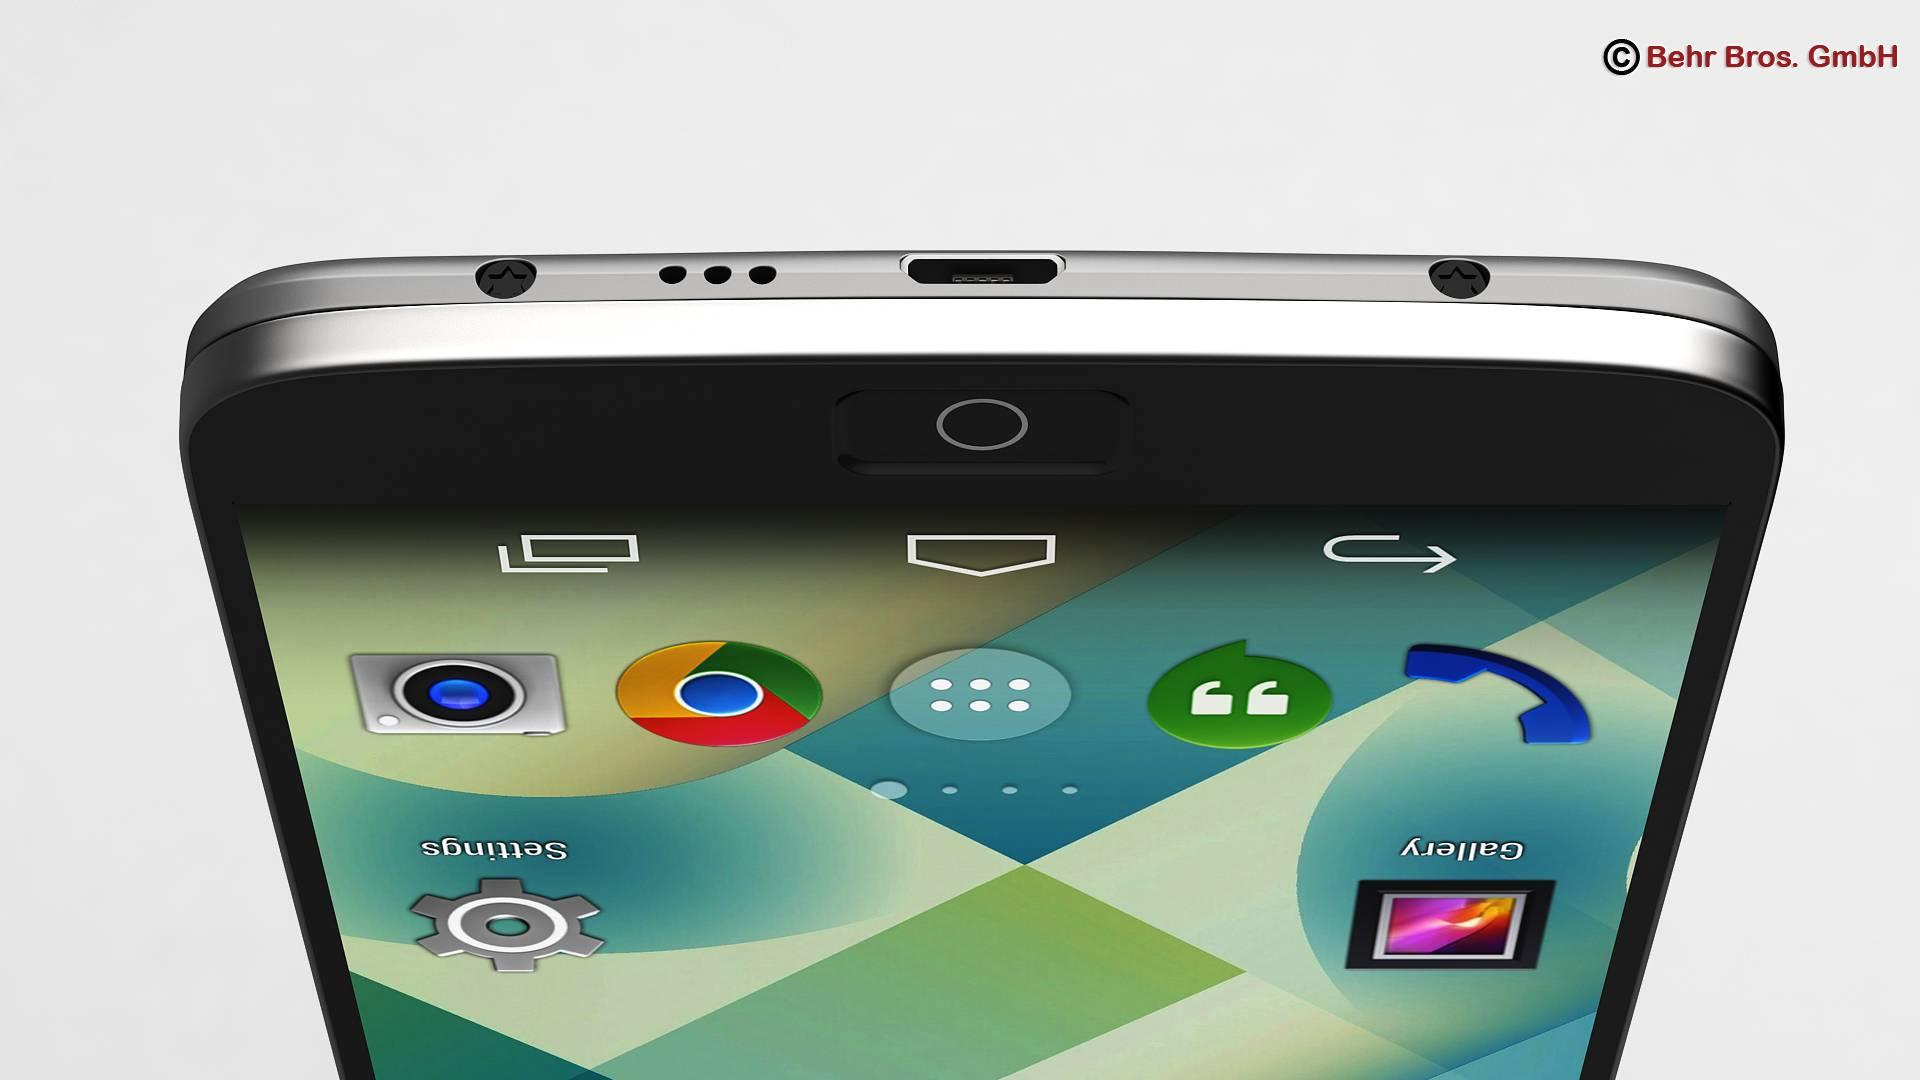 generic smartphone 6 inch 3d model 3ds max fbx c4d lwo ma mb obj 161664